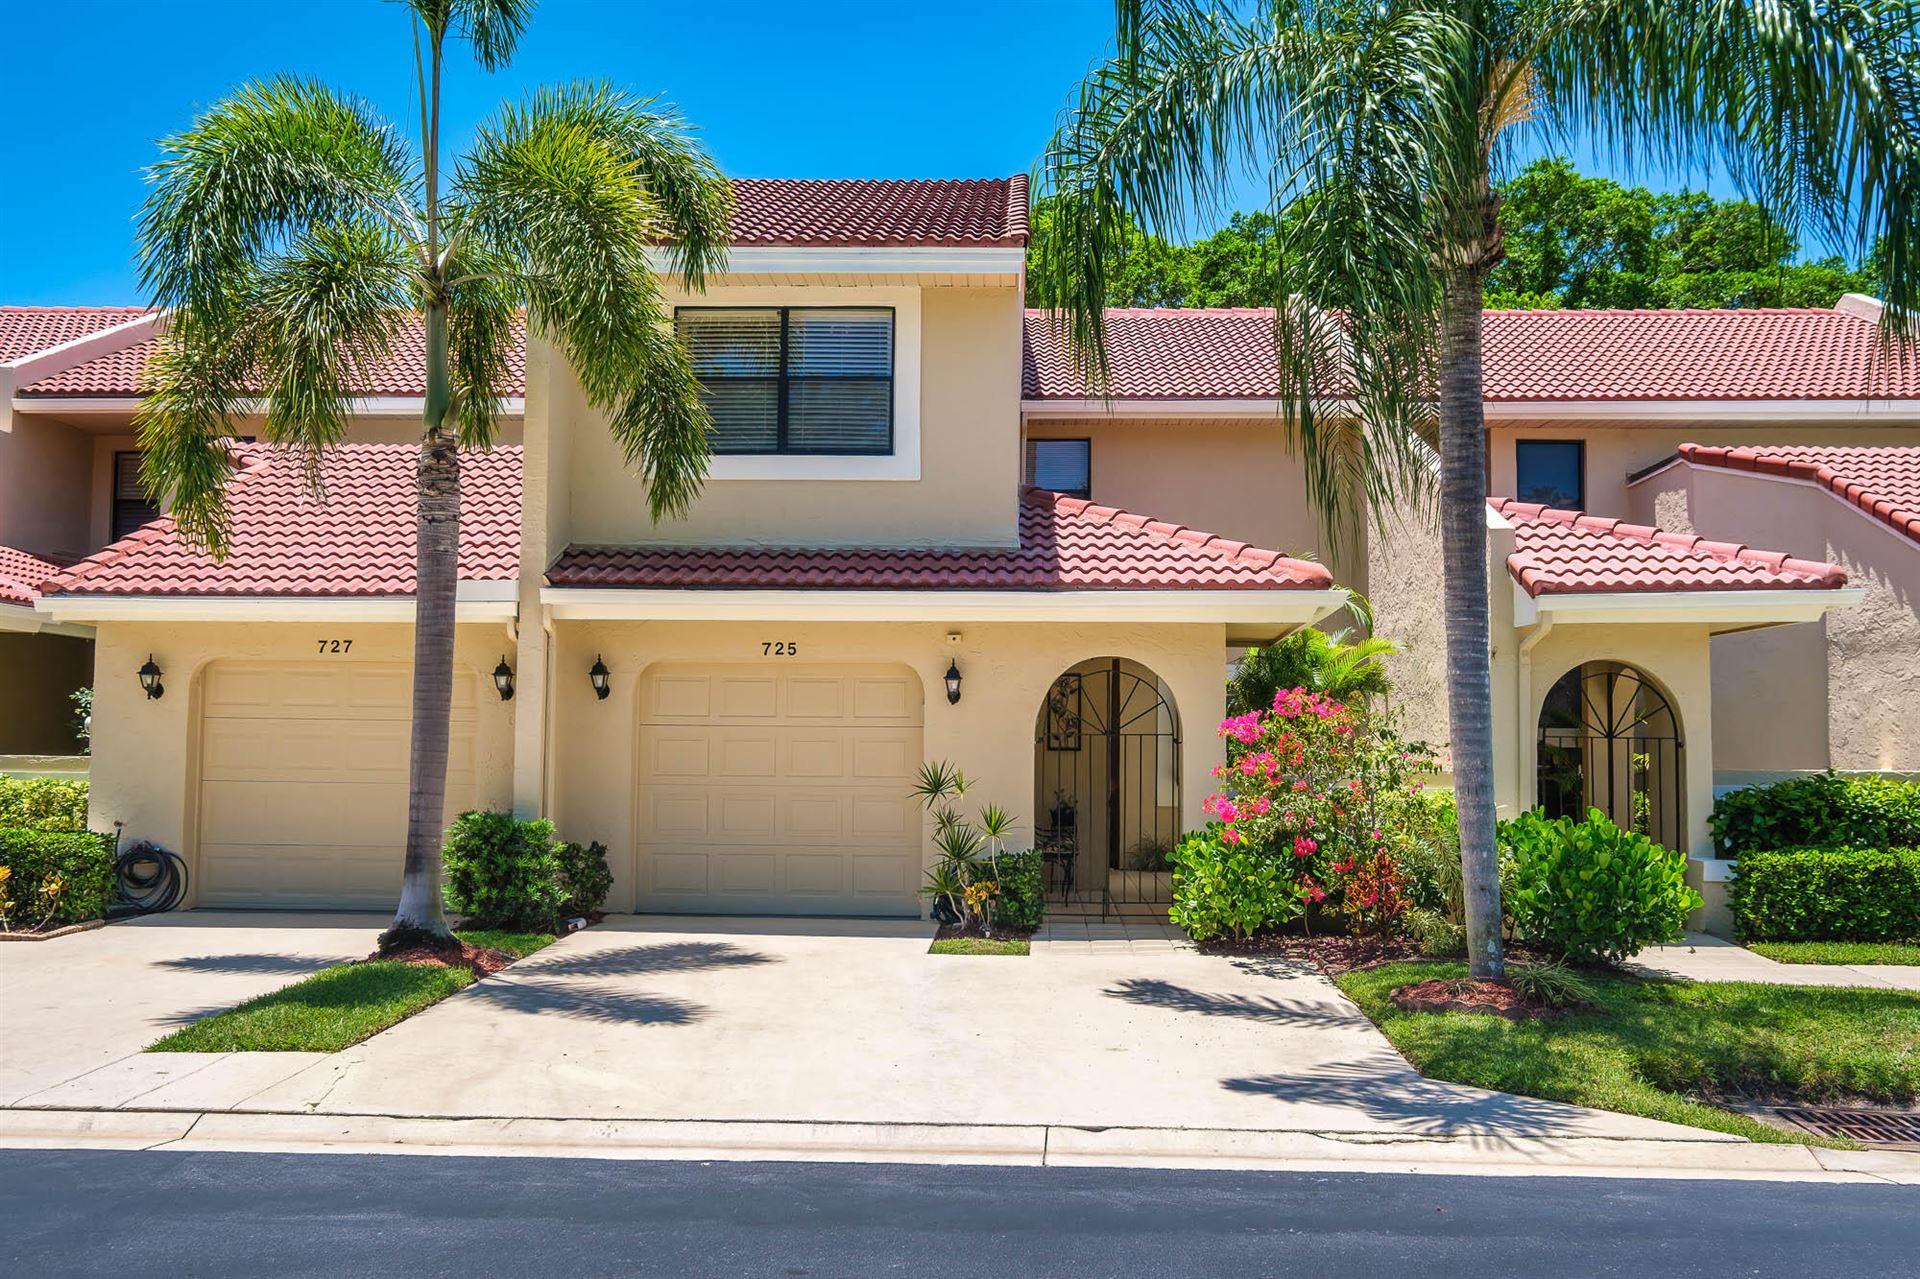 Photo of 725 Windermere Way, Palm Beach Gardens, FL 33418 (MLS # RX-10719232)